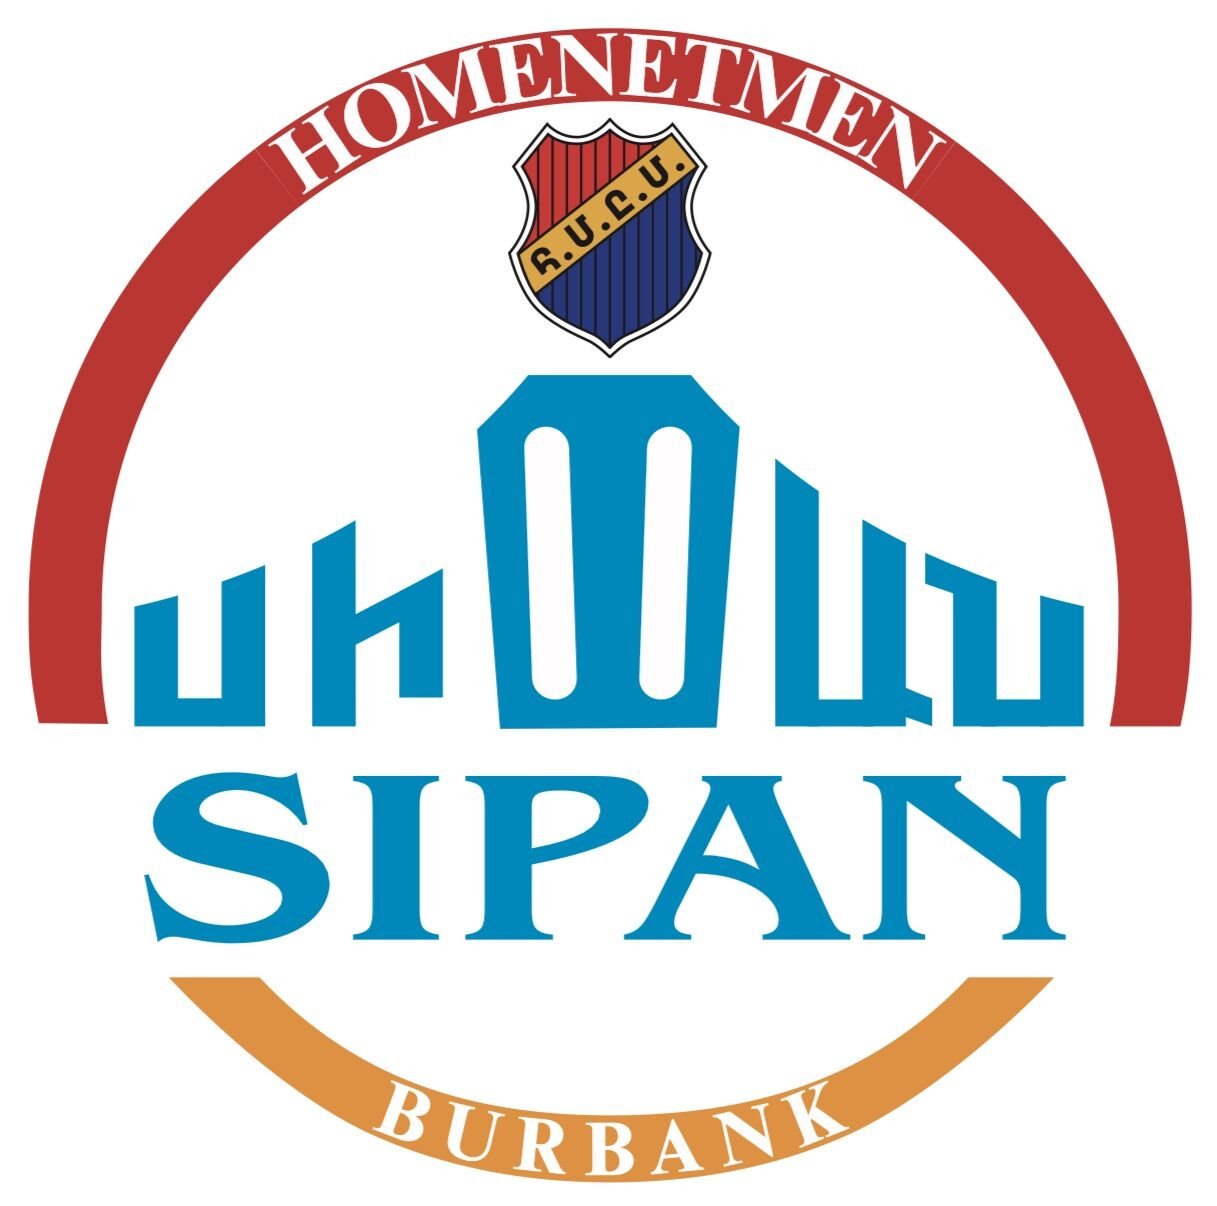 Homenetmen Burbank 'Sipan' Chapter